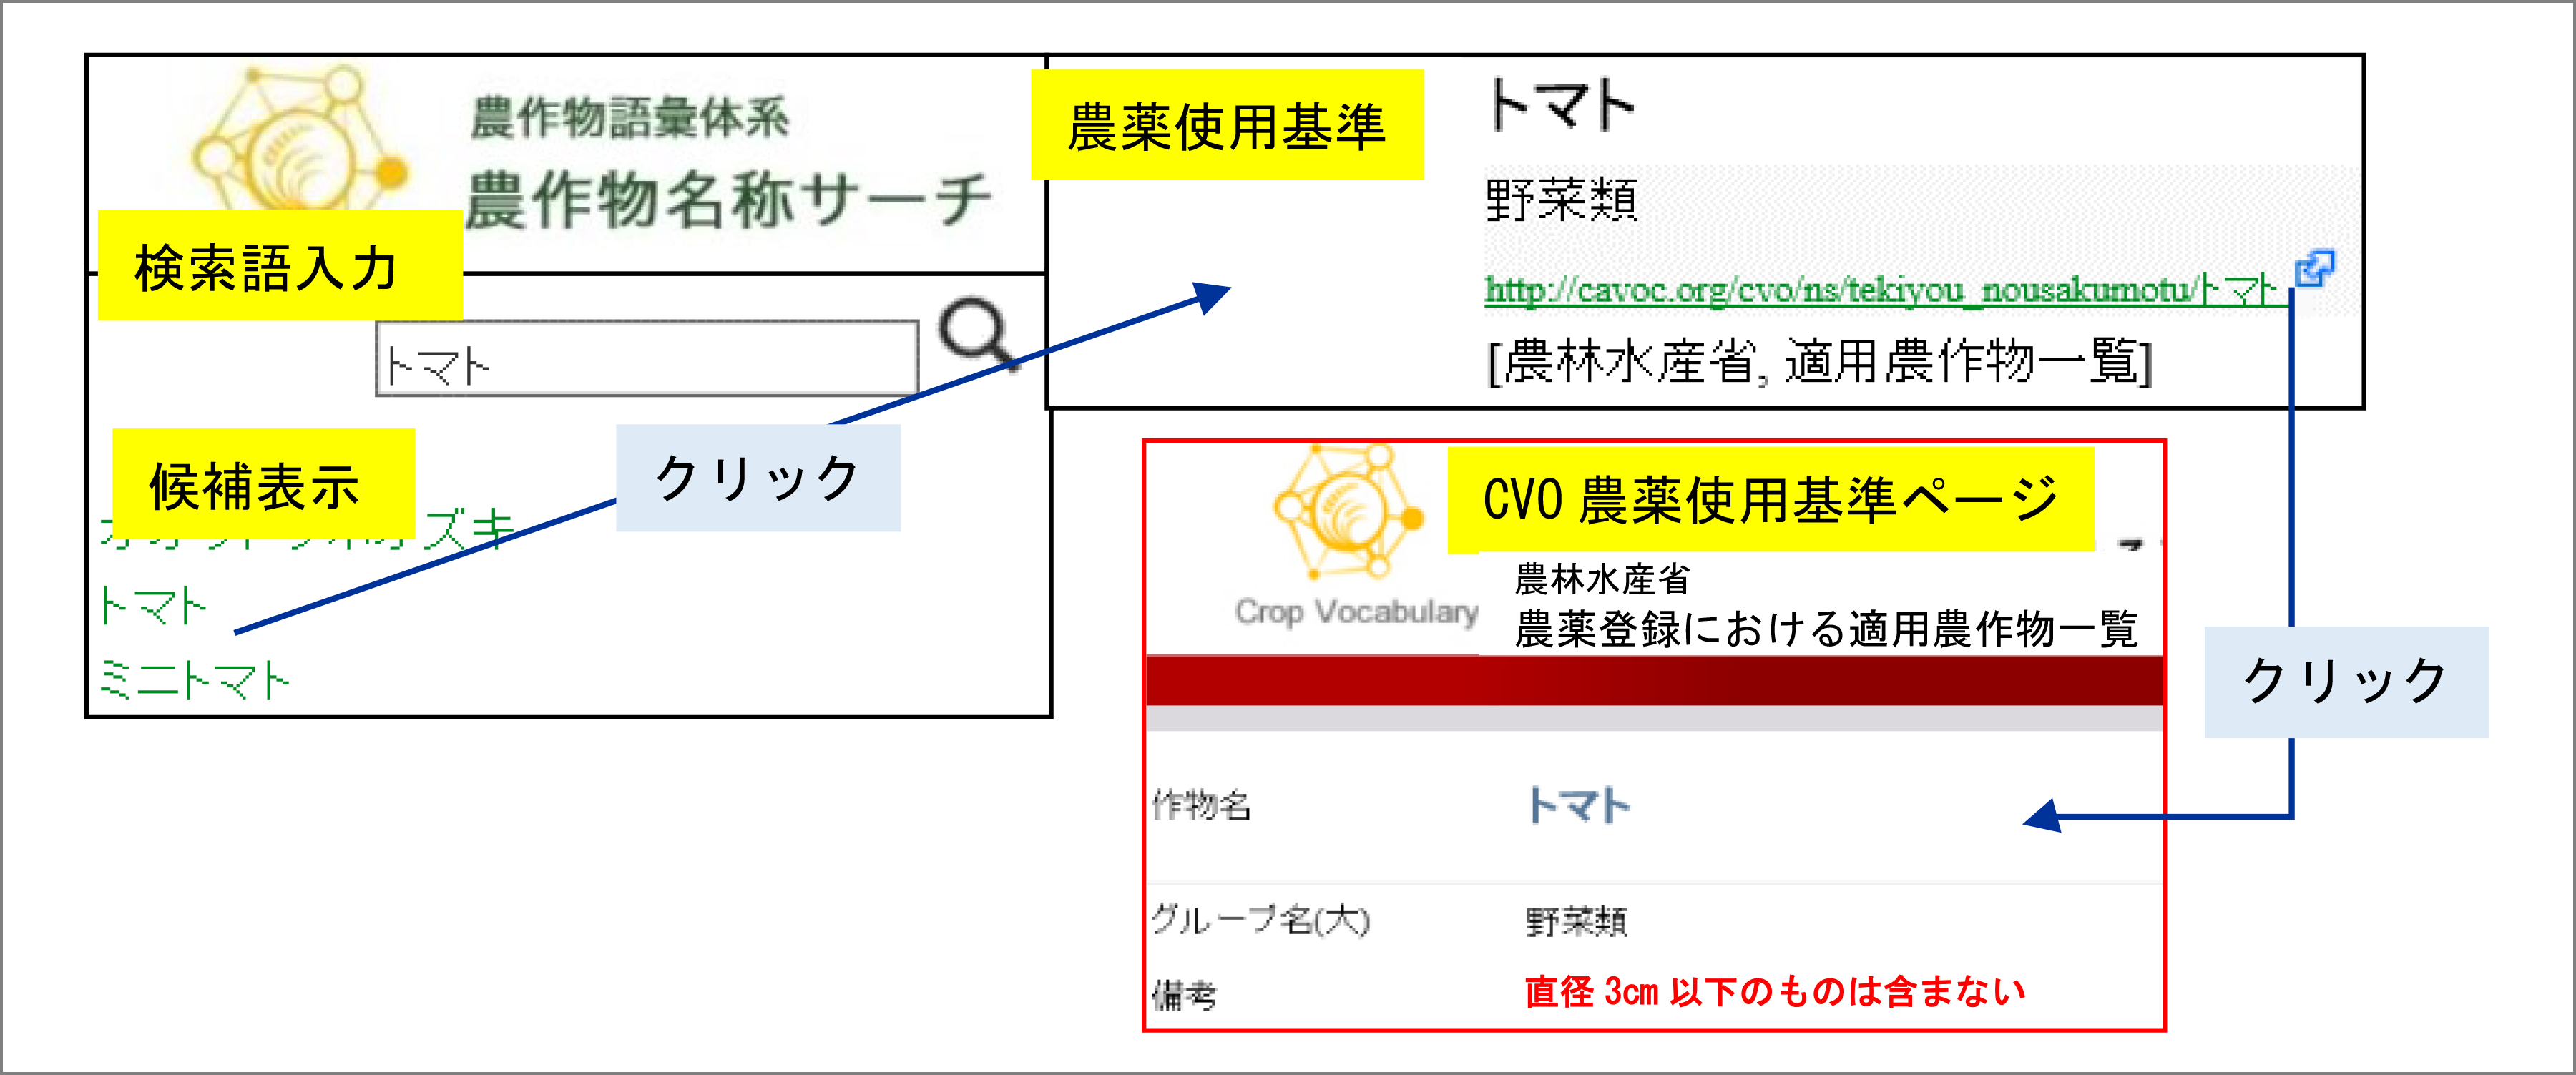 nii_newsrelease_20190403_image3.png